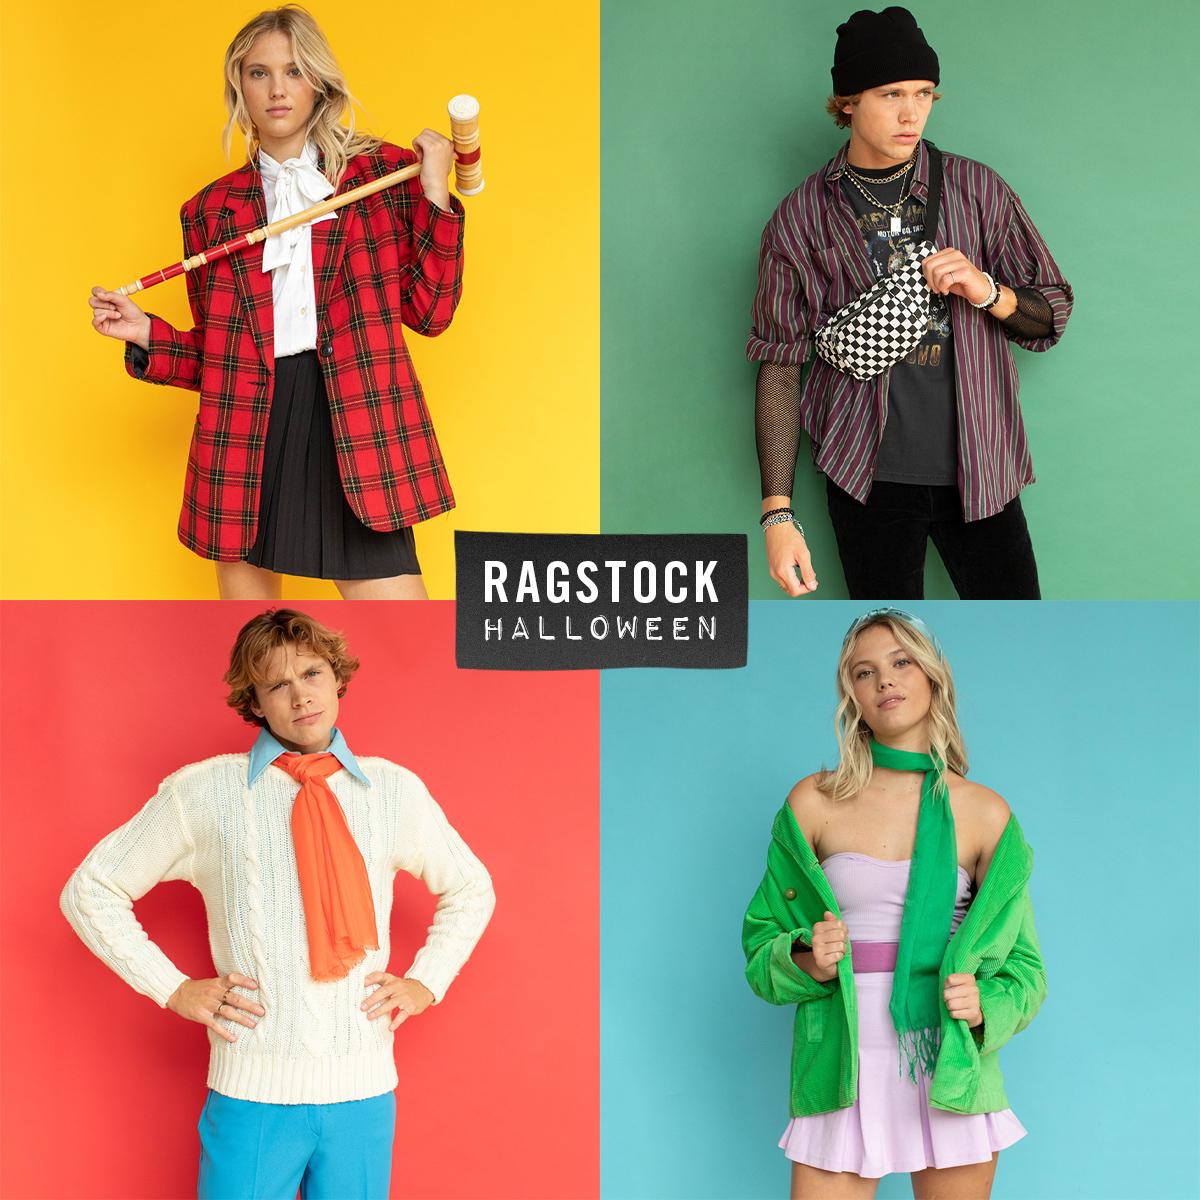 Halloween at Ragstock